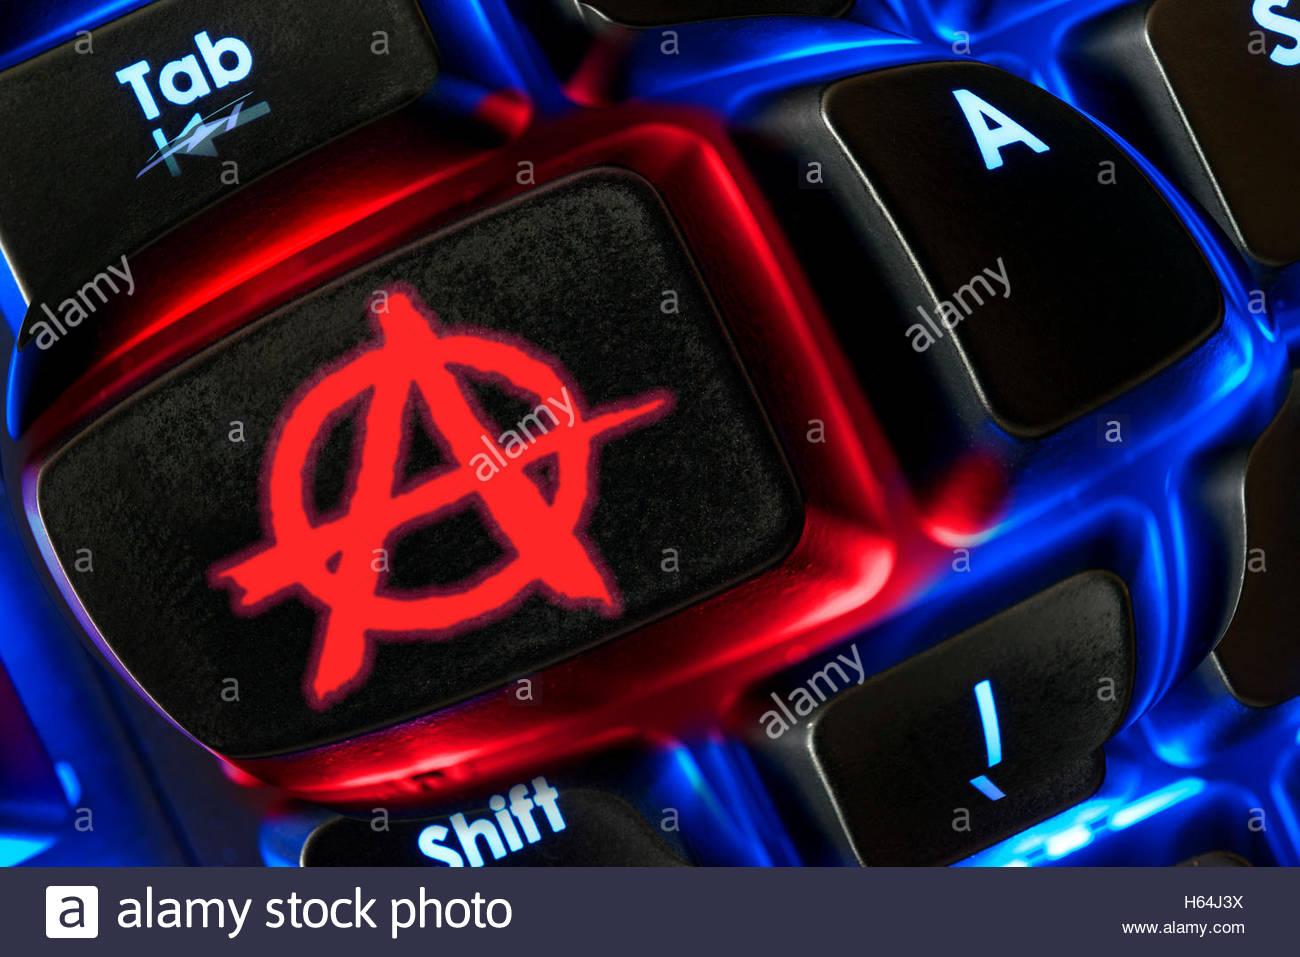 Anarchy emoji shown on a backlit keyboard, Dorset, England, UK - Stock Image